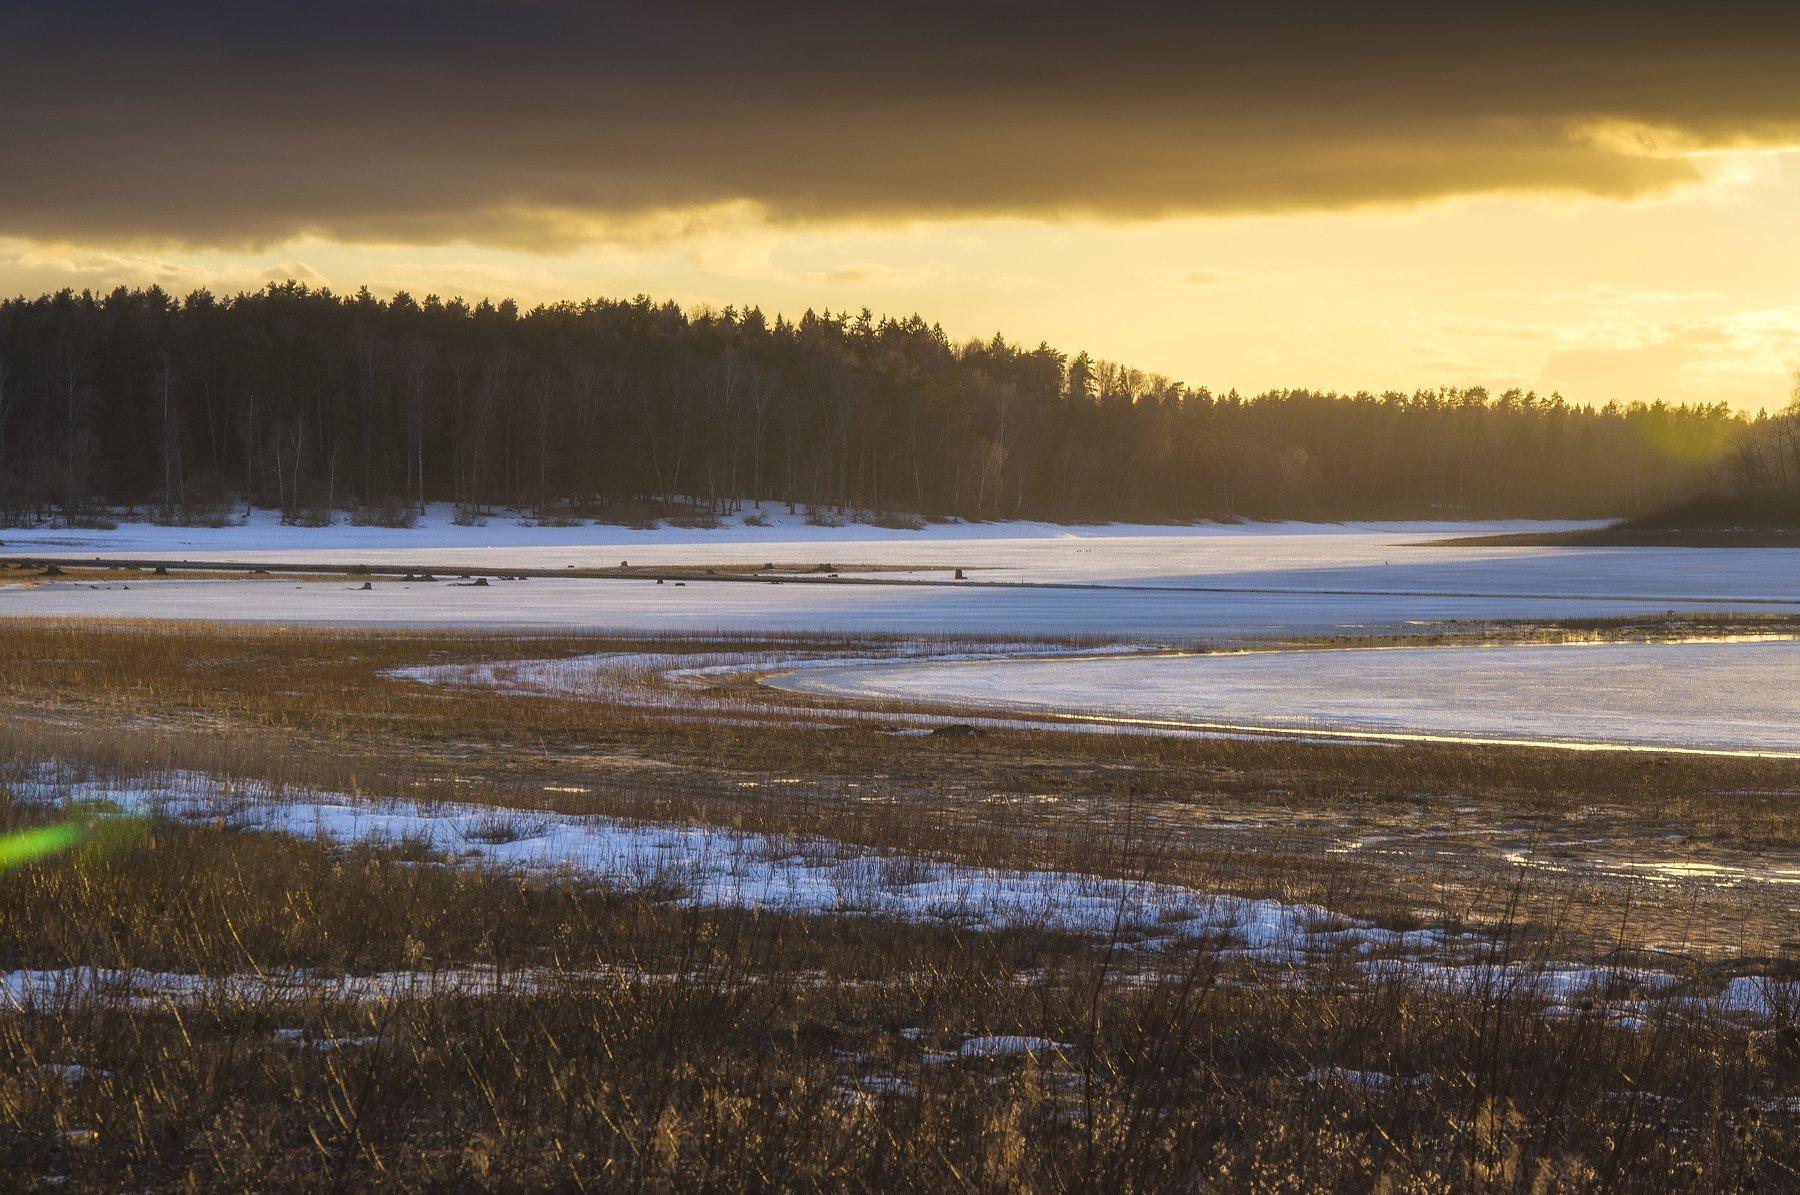 природа,пейзаж,лед,зима,закат, Павел Ныриков